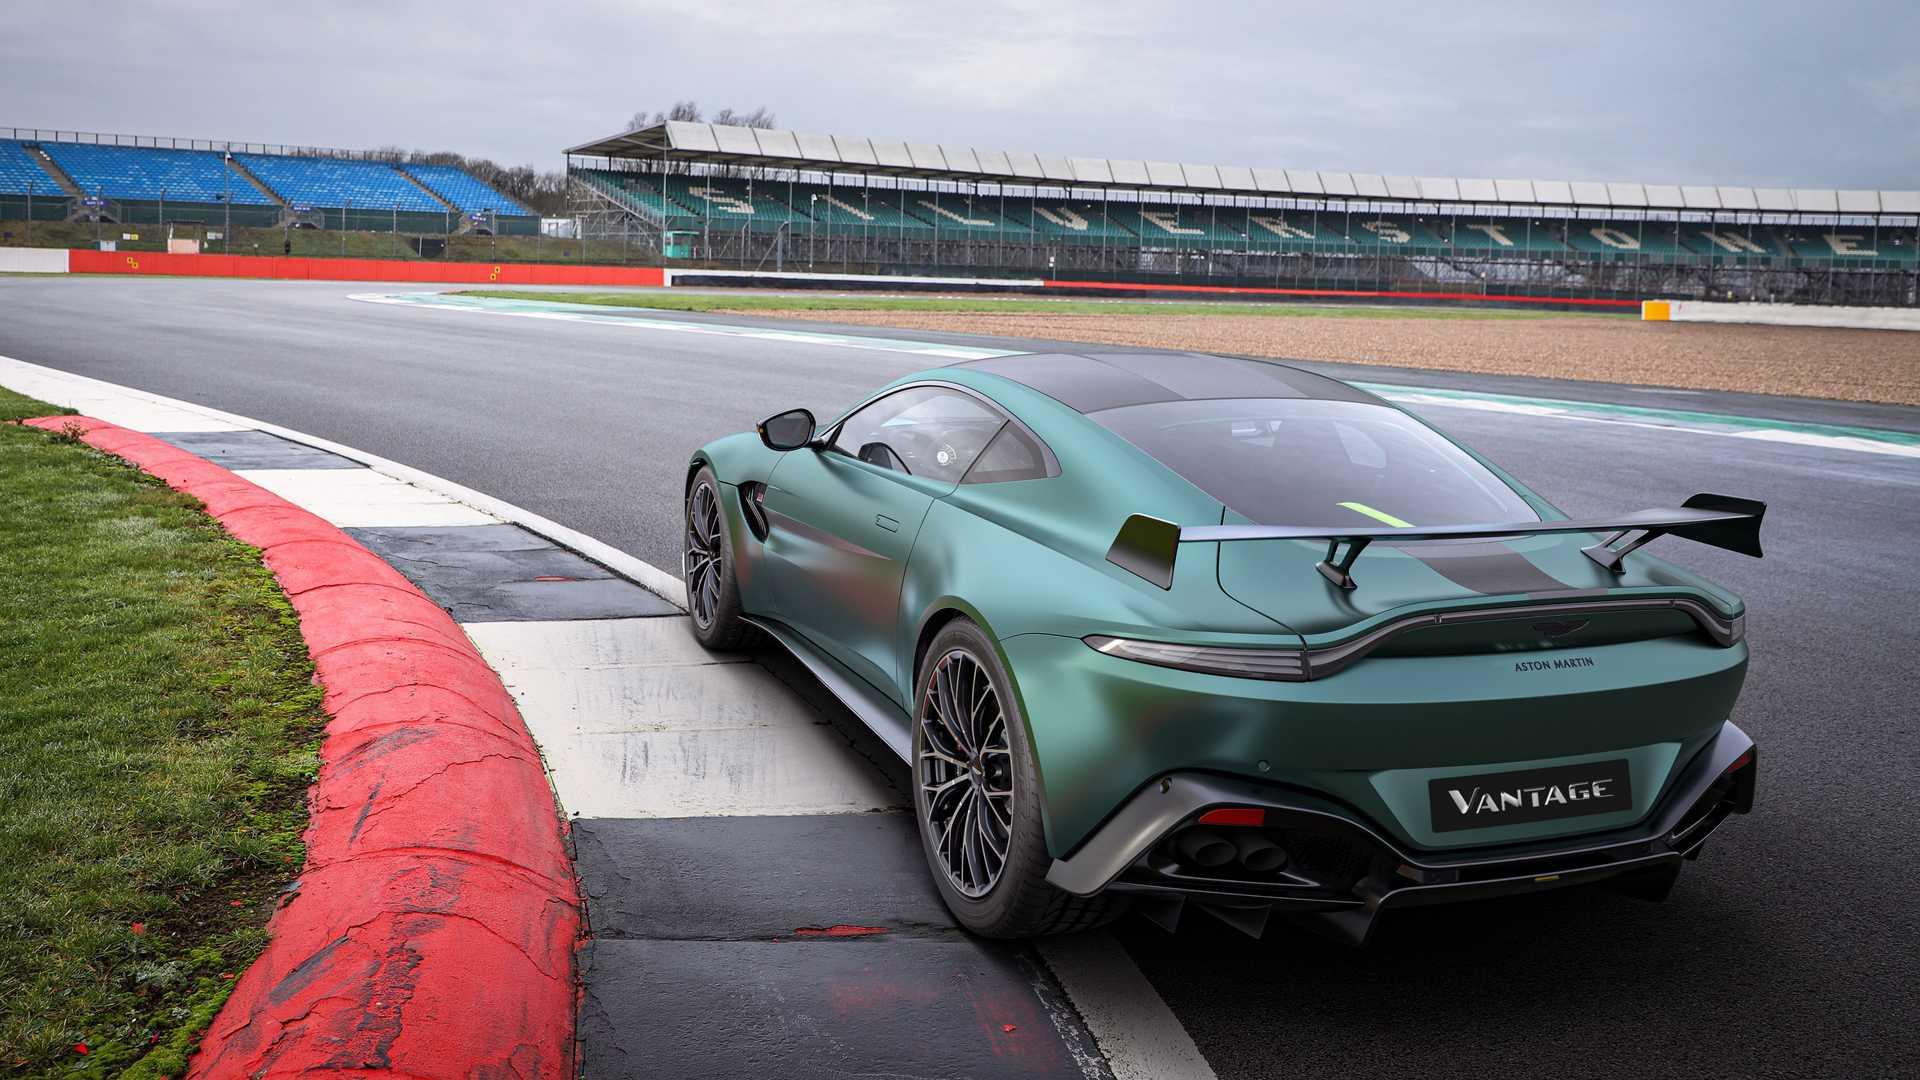 H Aston Martin γιορτάζει την επιστροφή της στην Formula 1 με μια ξεχωριστή έκδοση της Vantage (pics)